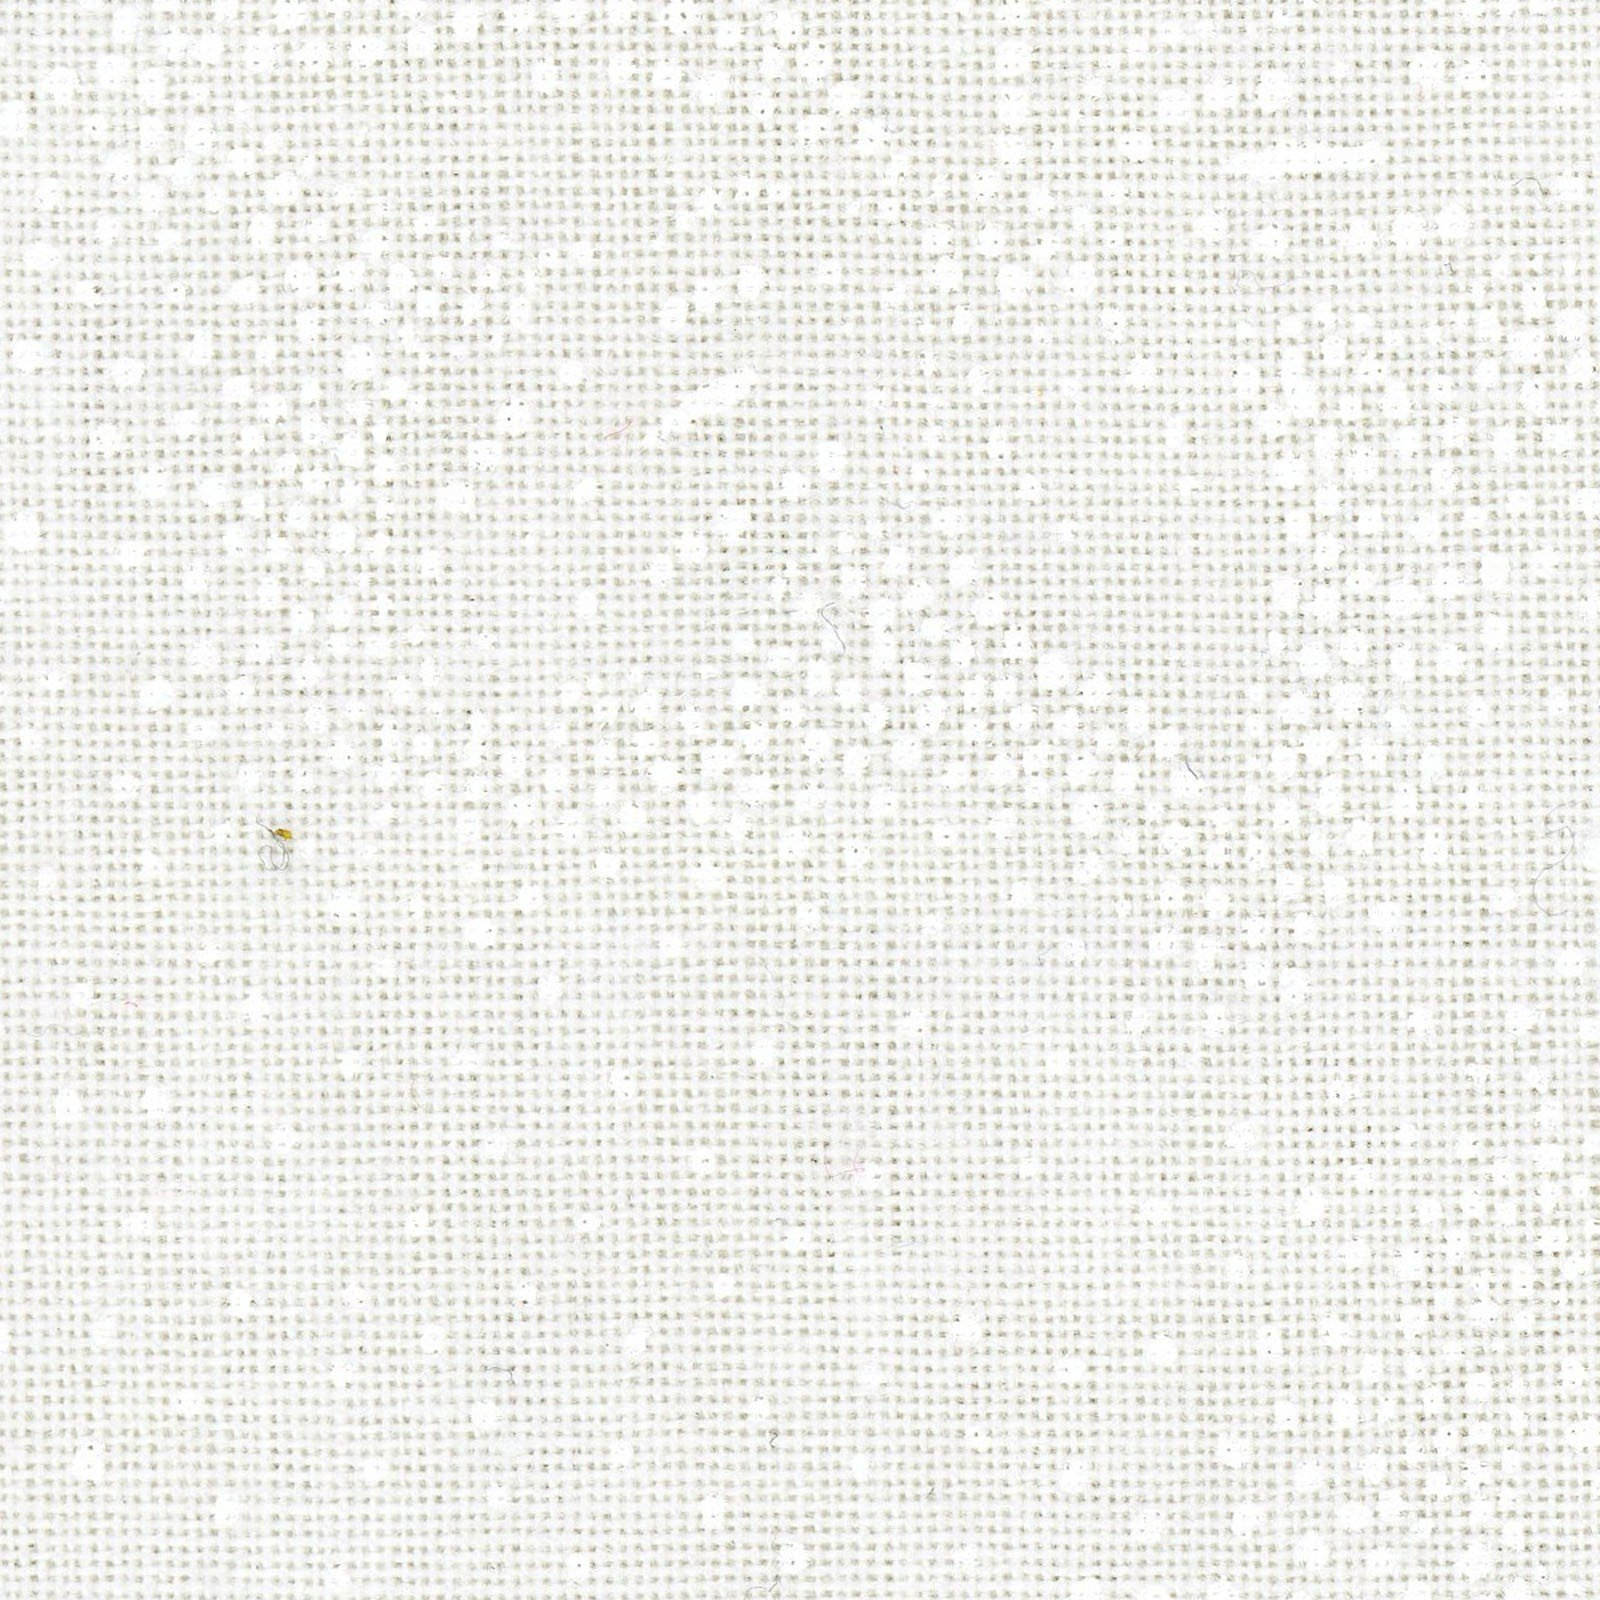 Quilters 108 Wide - Cream - GALQ108W42249--CRE